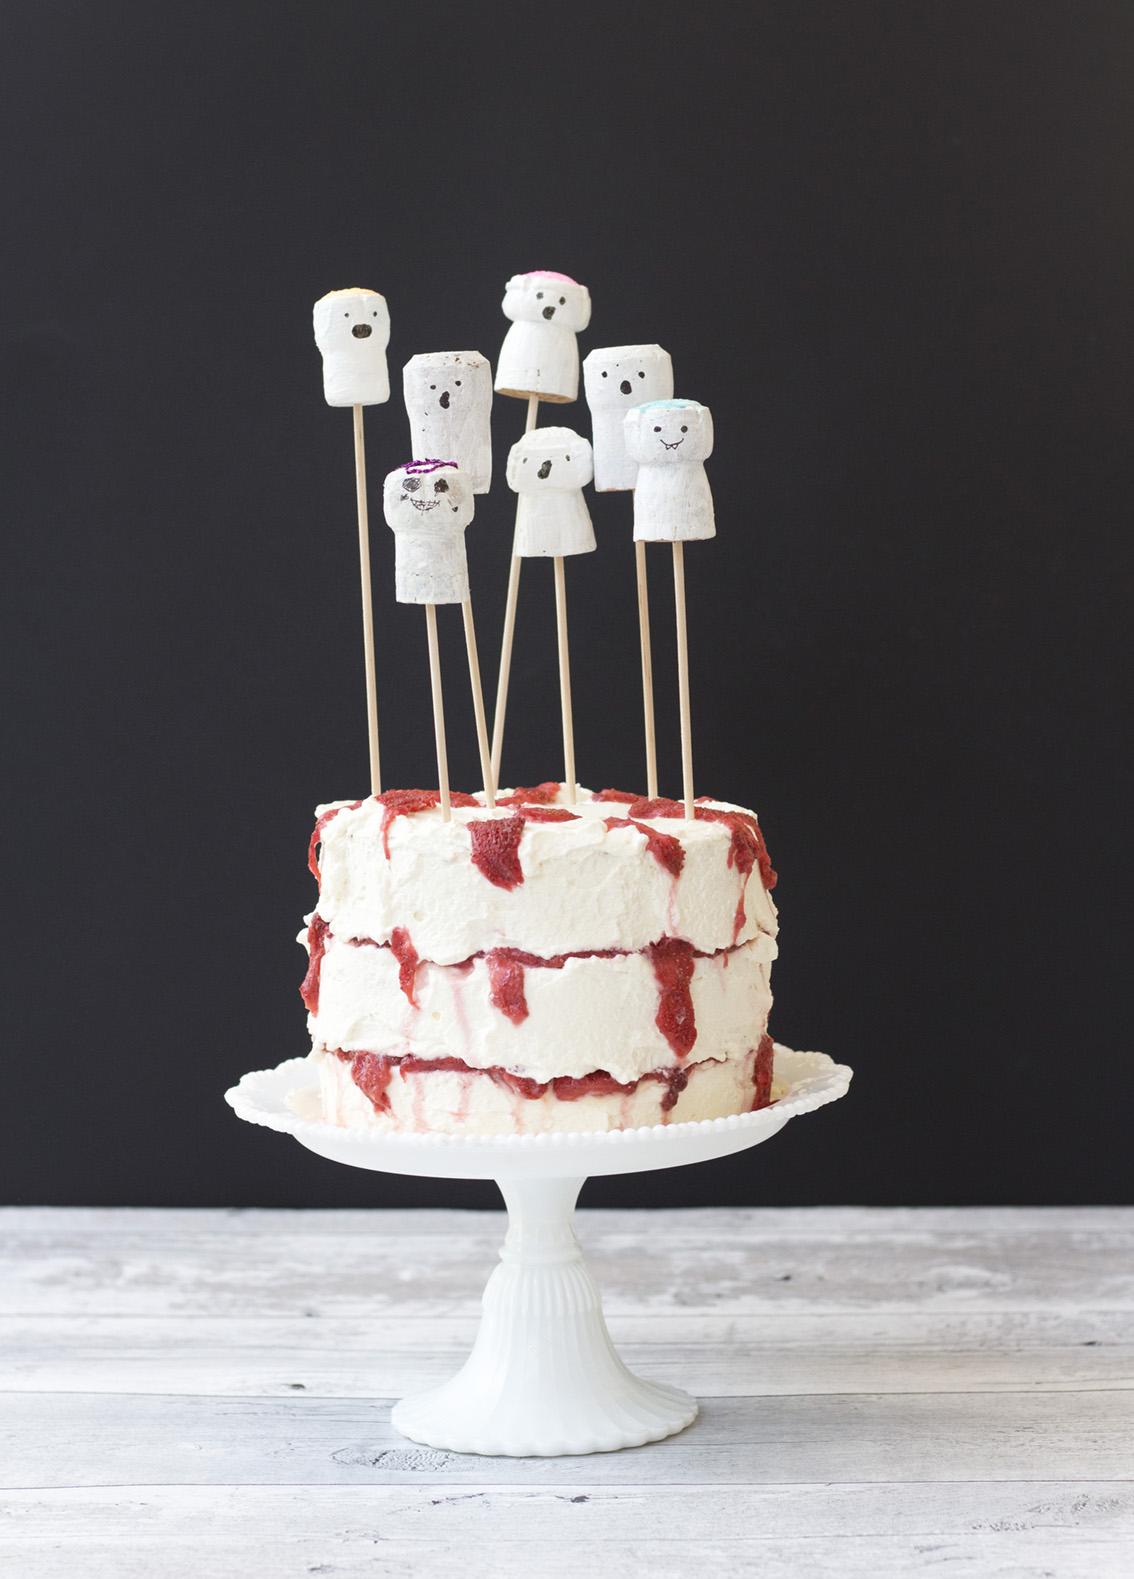 Spöken till tårtan | Pysselbolaget